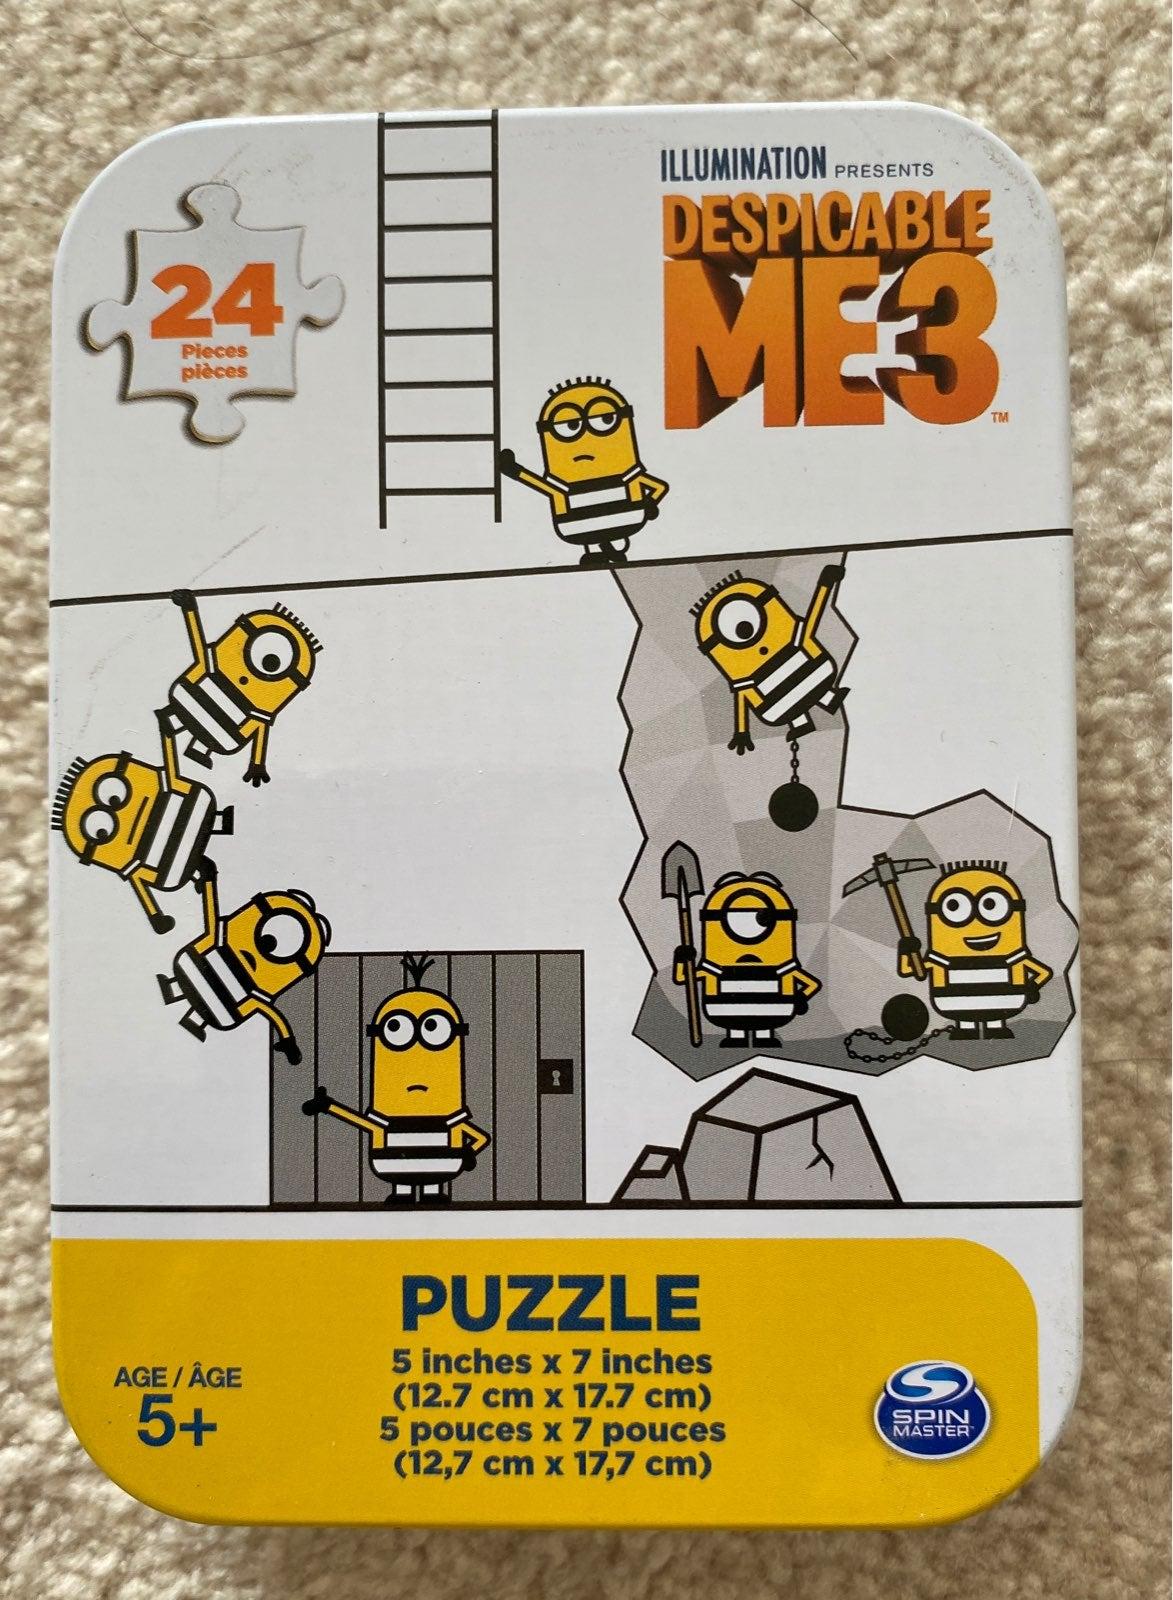 NEW Despicable Me 3 Puzzle